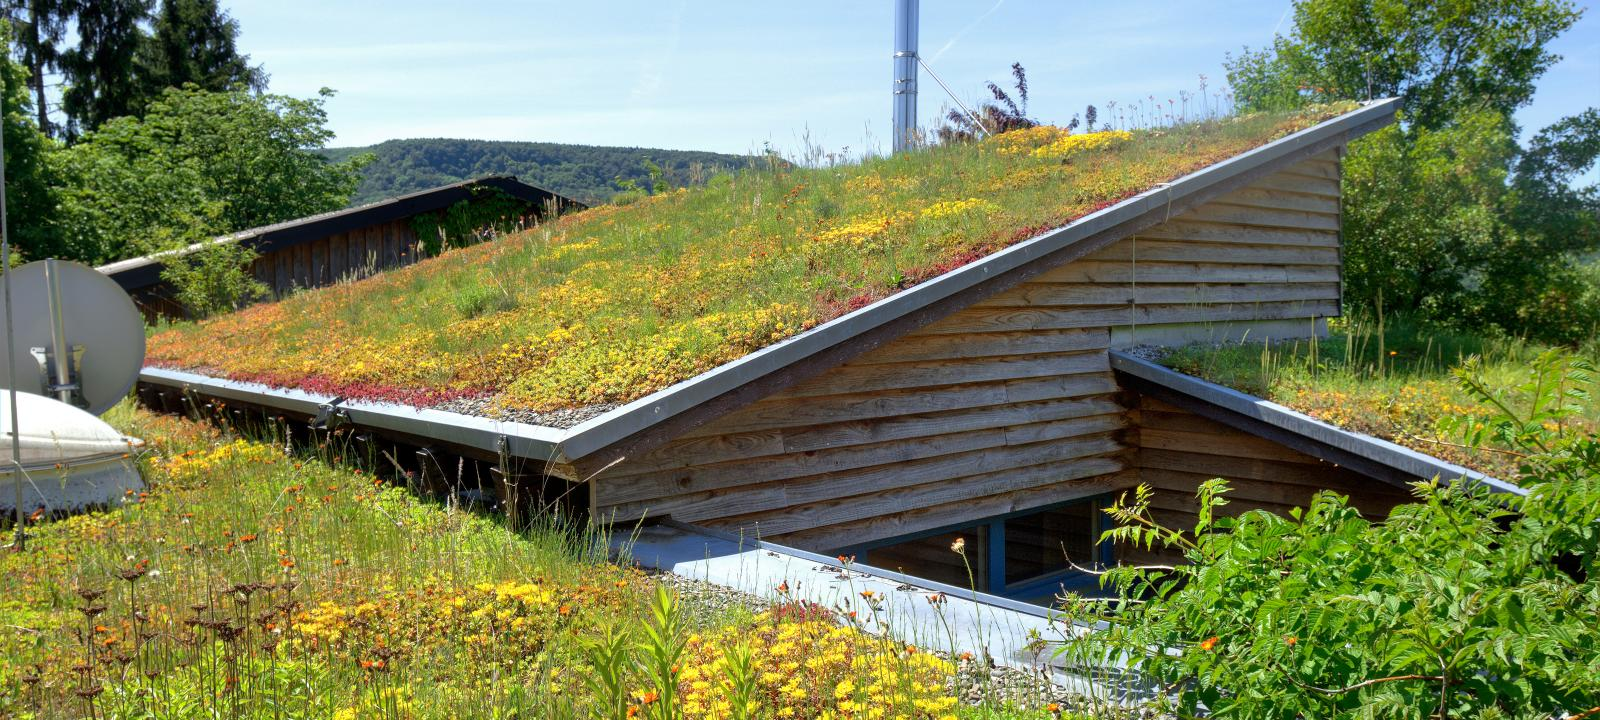 crisis-climatica-cambio-desastres-australia-techos-verdes-arquitectura